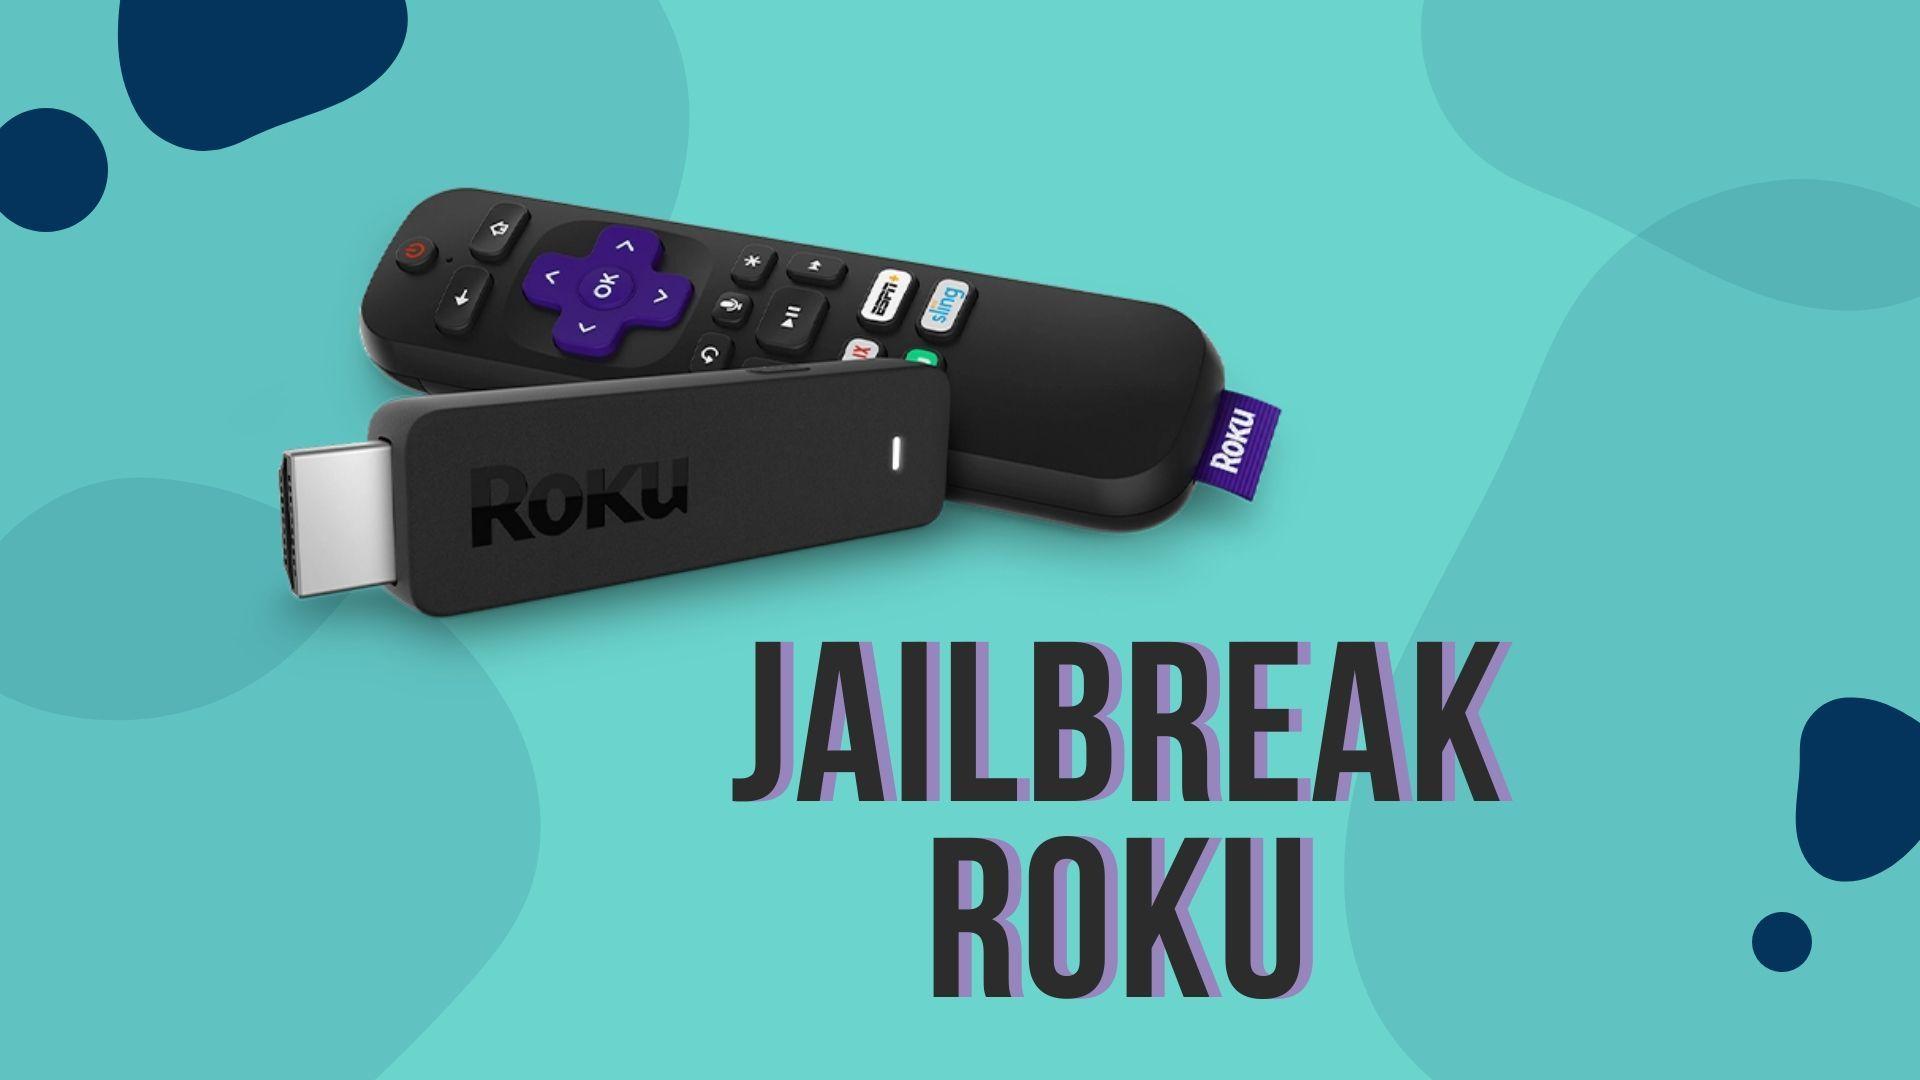 How to jailbreak a roku device in 2020 roku remote